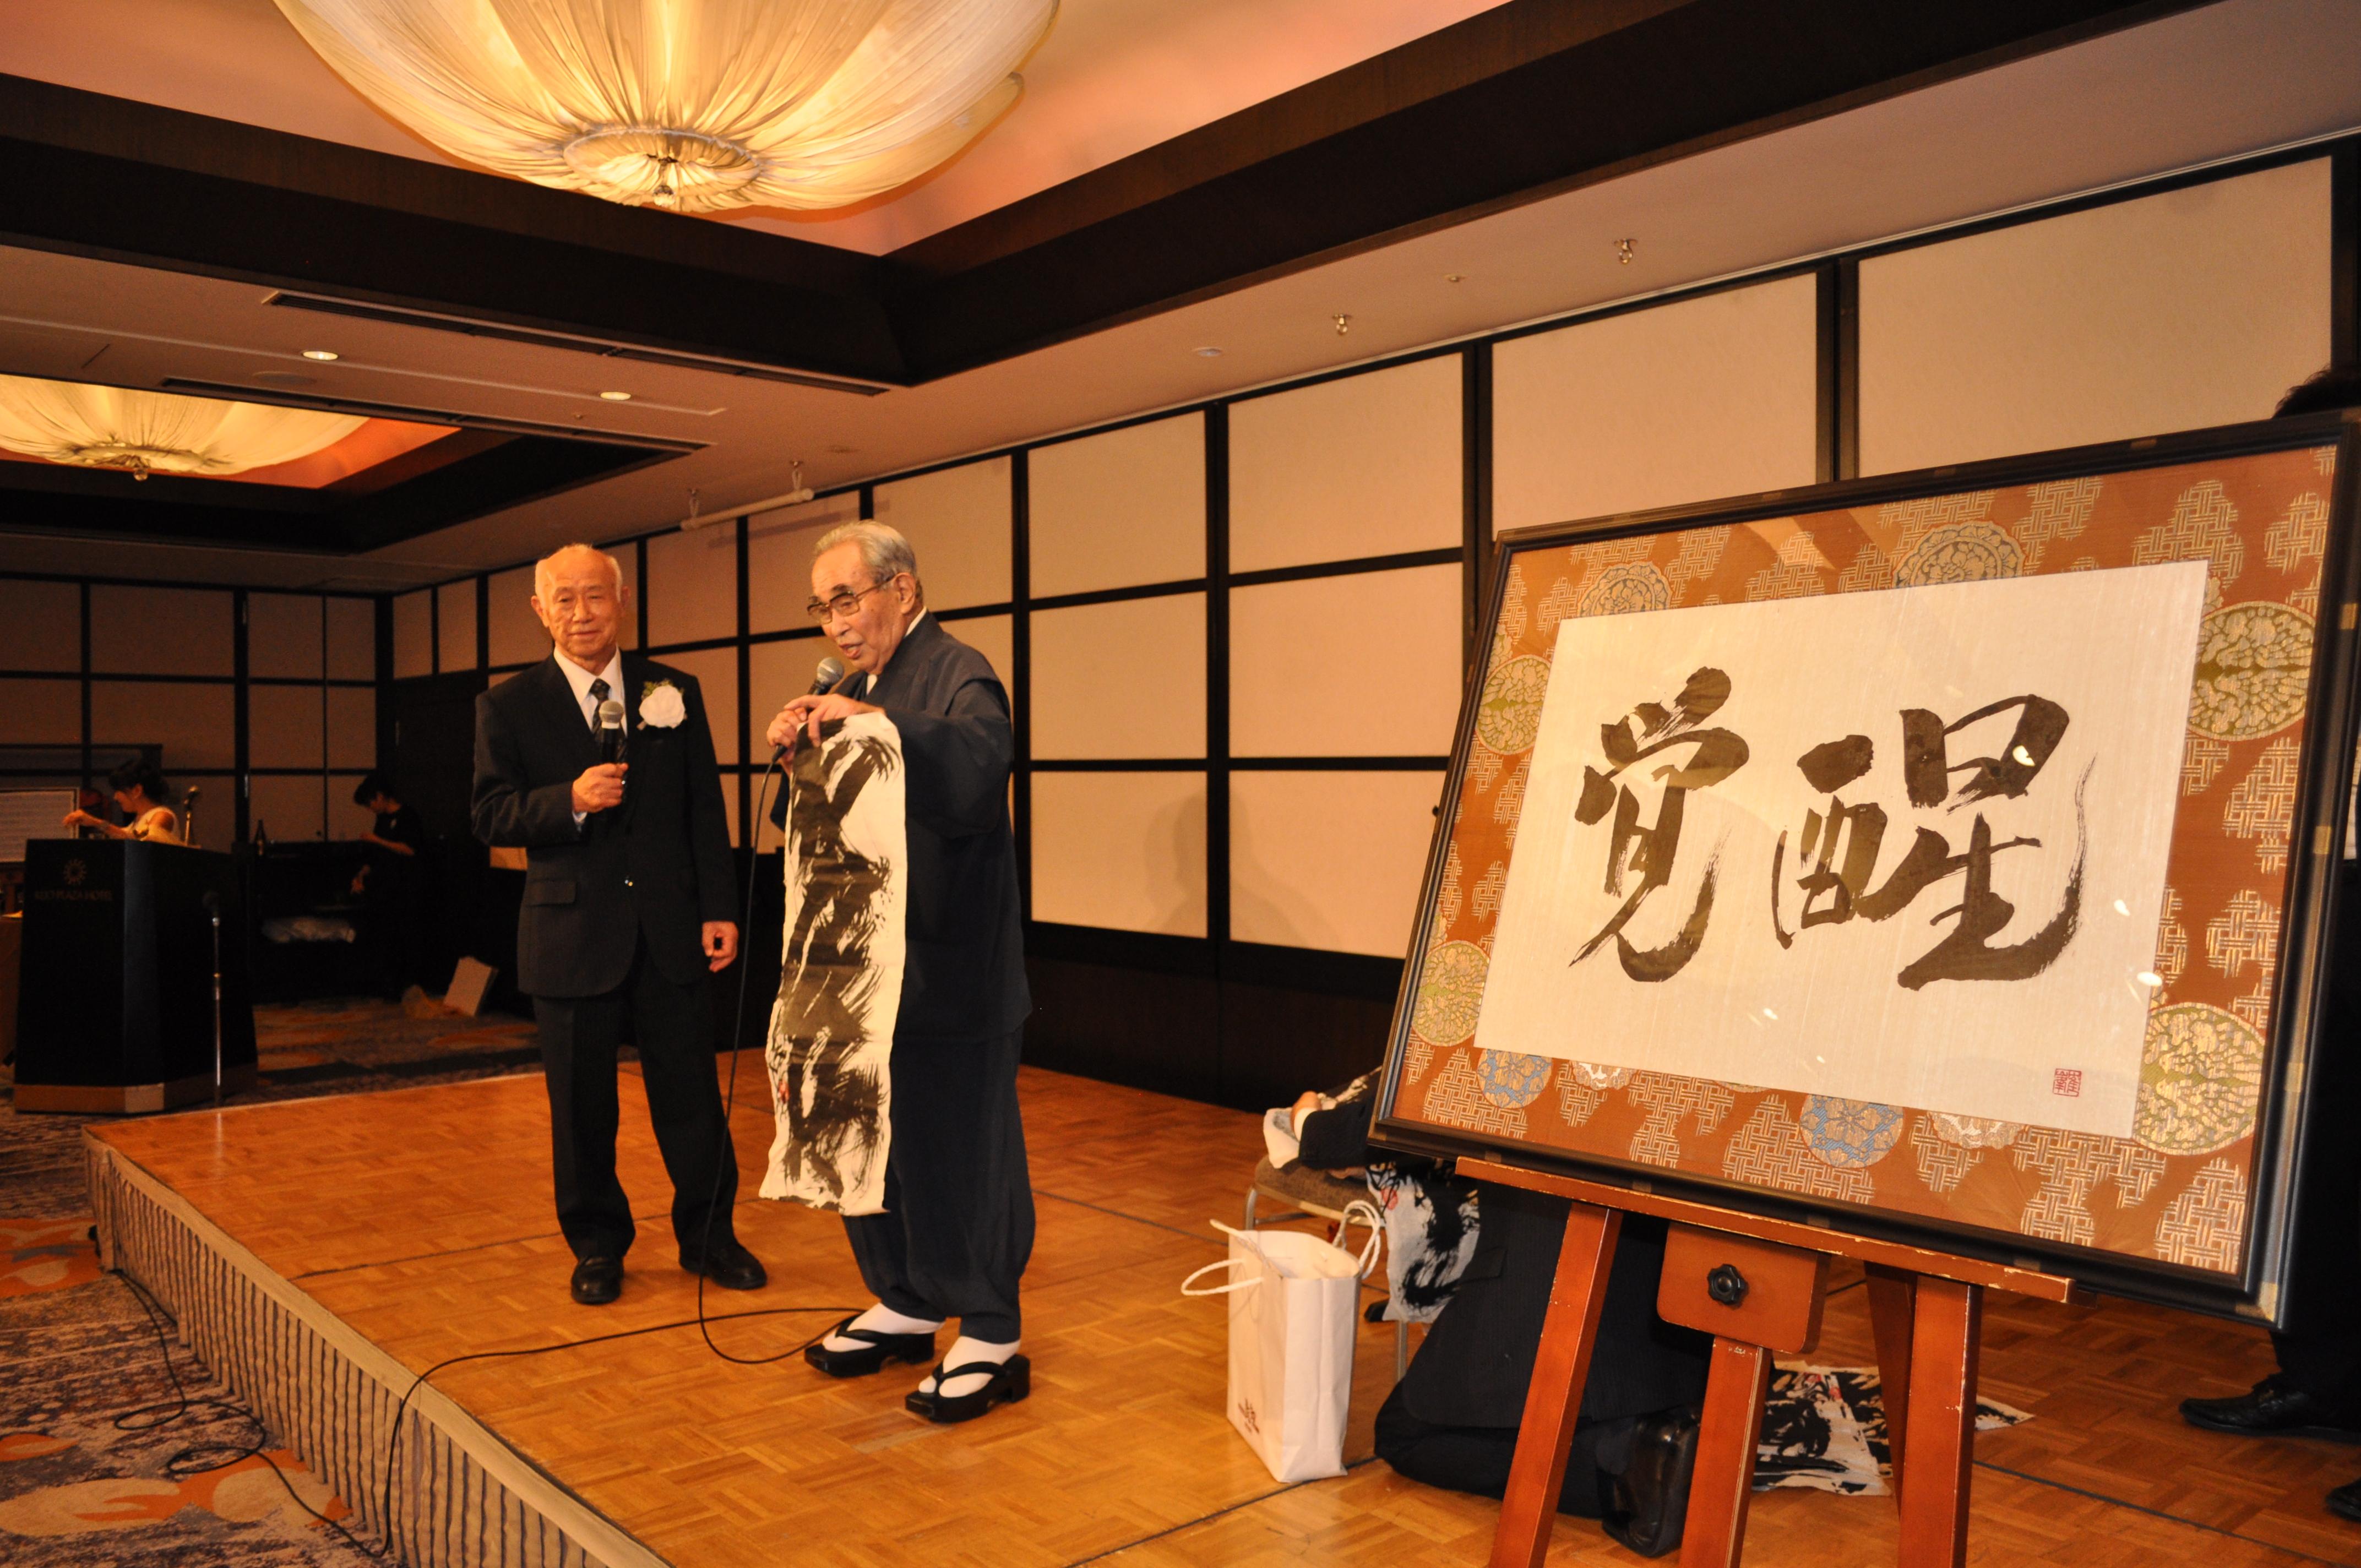 DSC 0545 - 第6回思風会全国大会2018in東京開催